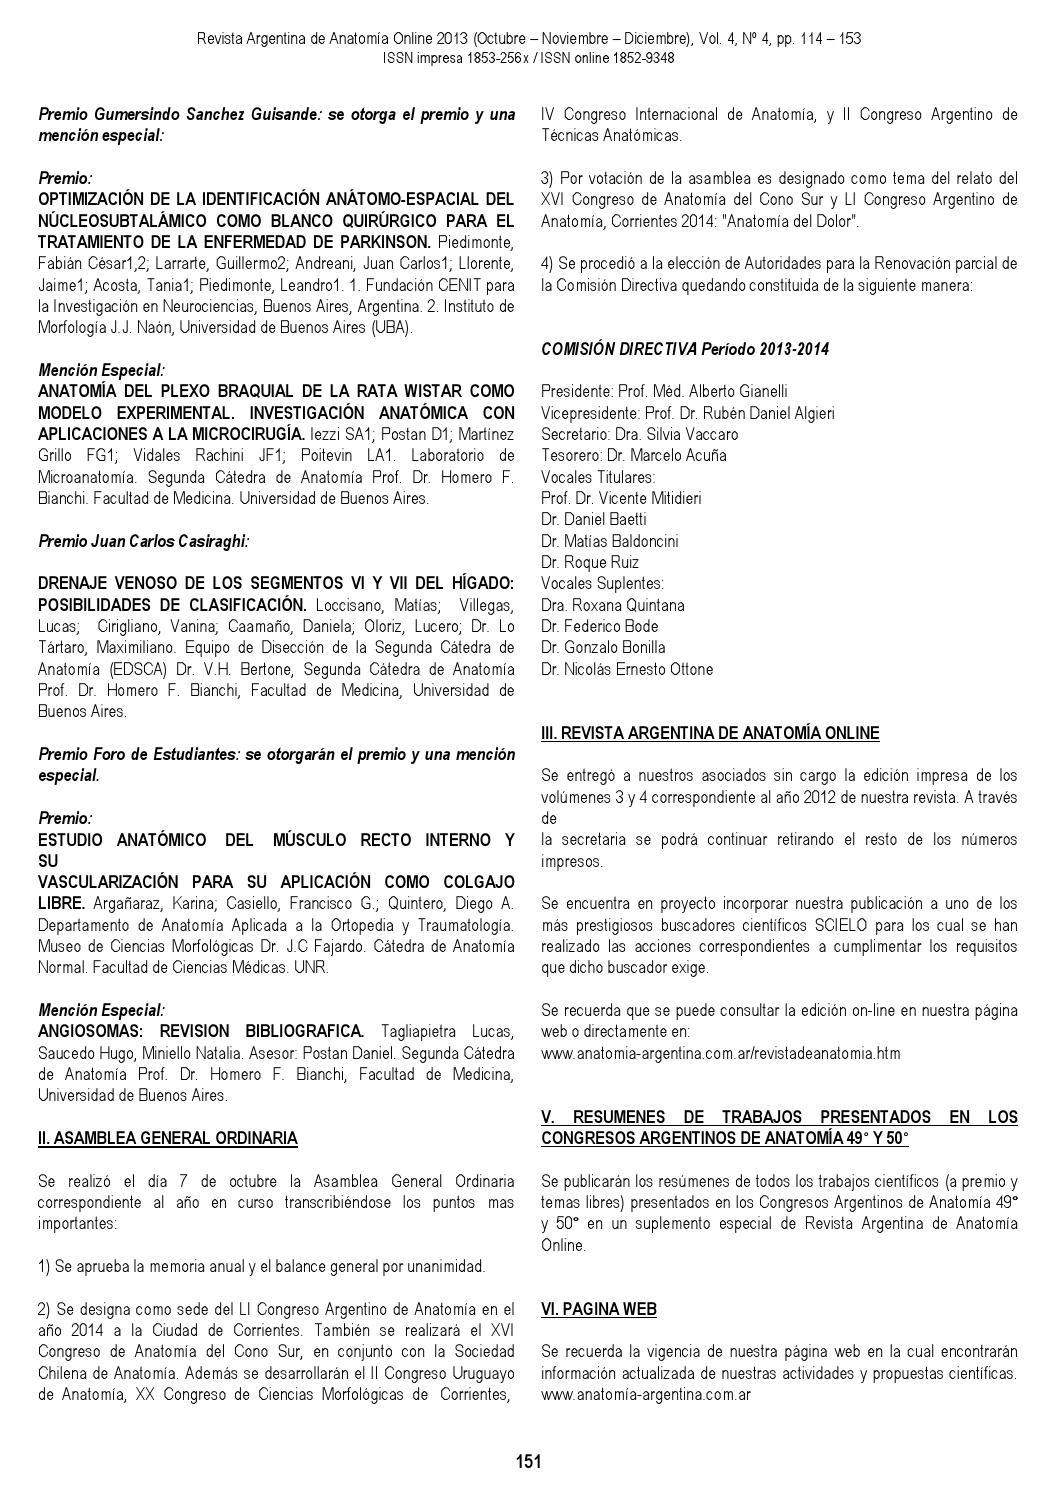 Rev. Arg. Anat. Onl. 2013; 4(4):114-153 by Nicolas Ottone - issuu